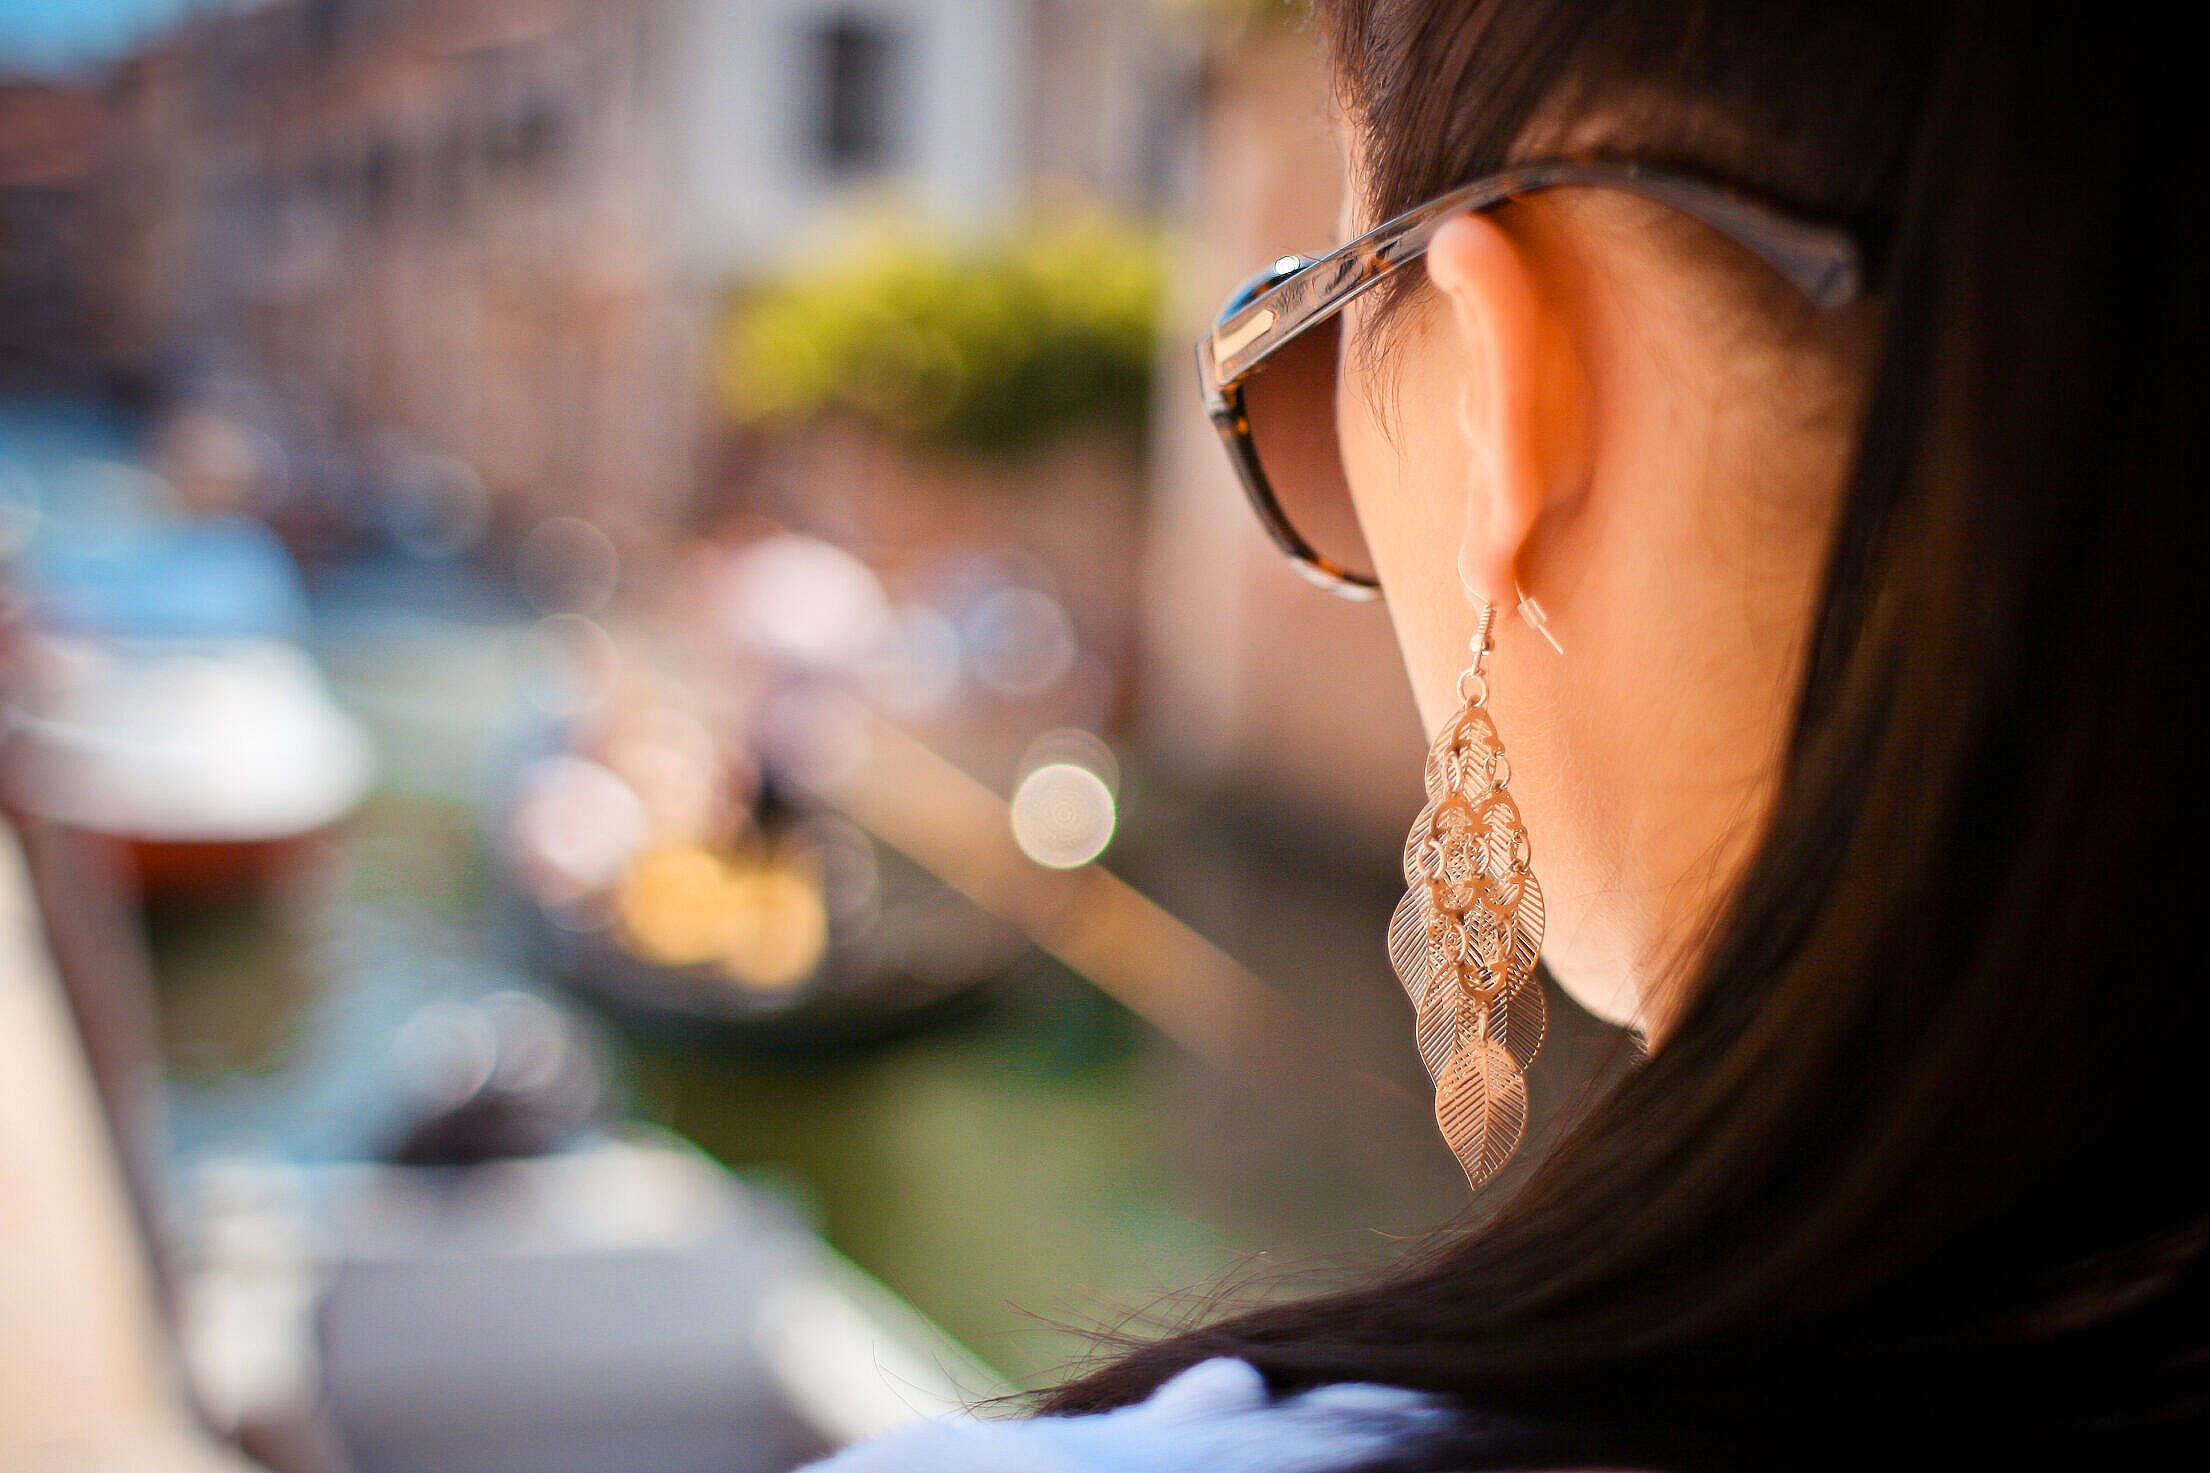 Girl Looking at Venice Gondola Free Stock Photo